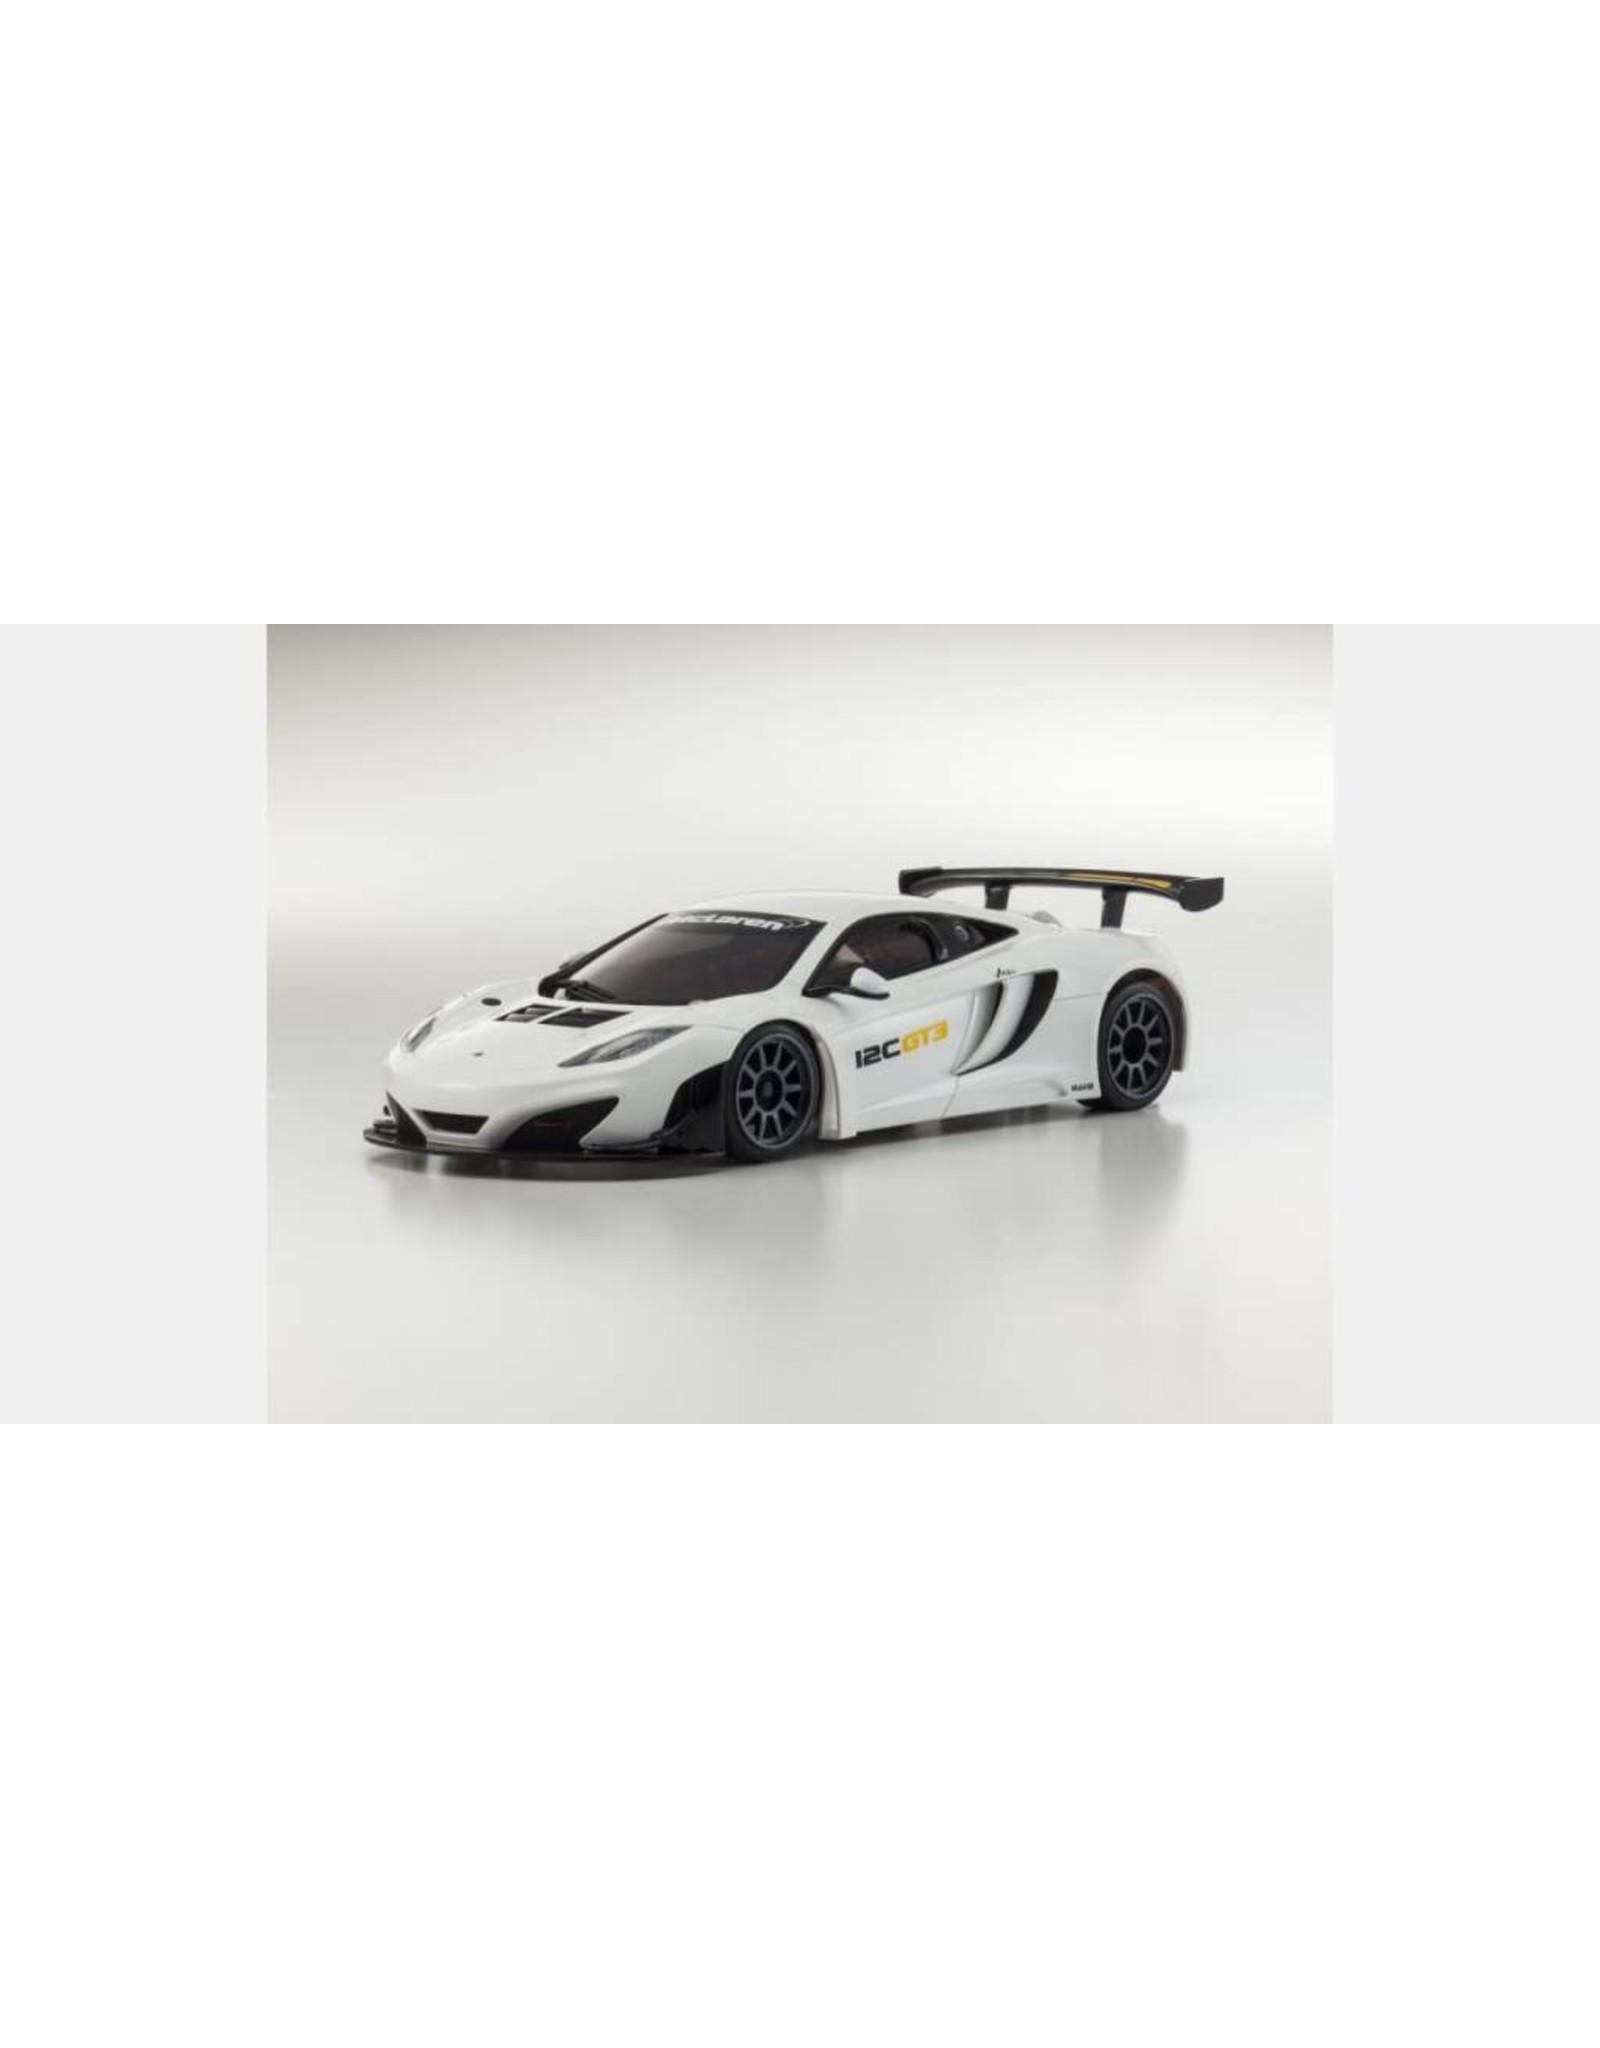 Kyosho ASC MR-03W-MM McLaren 12C GT3 2013 White